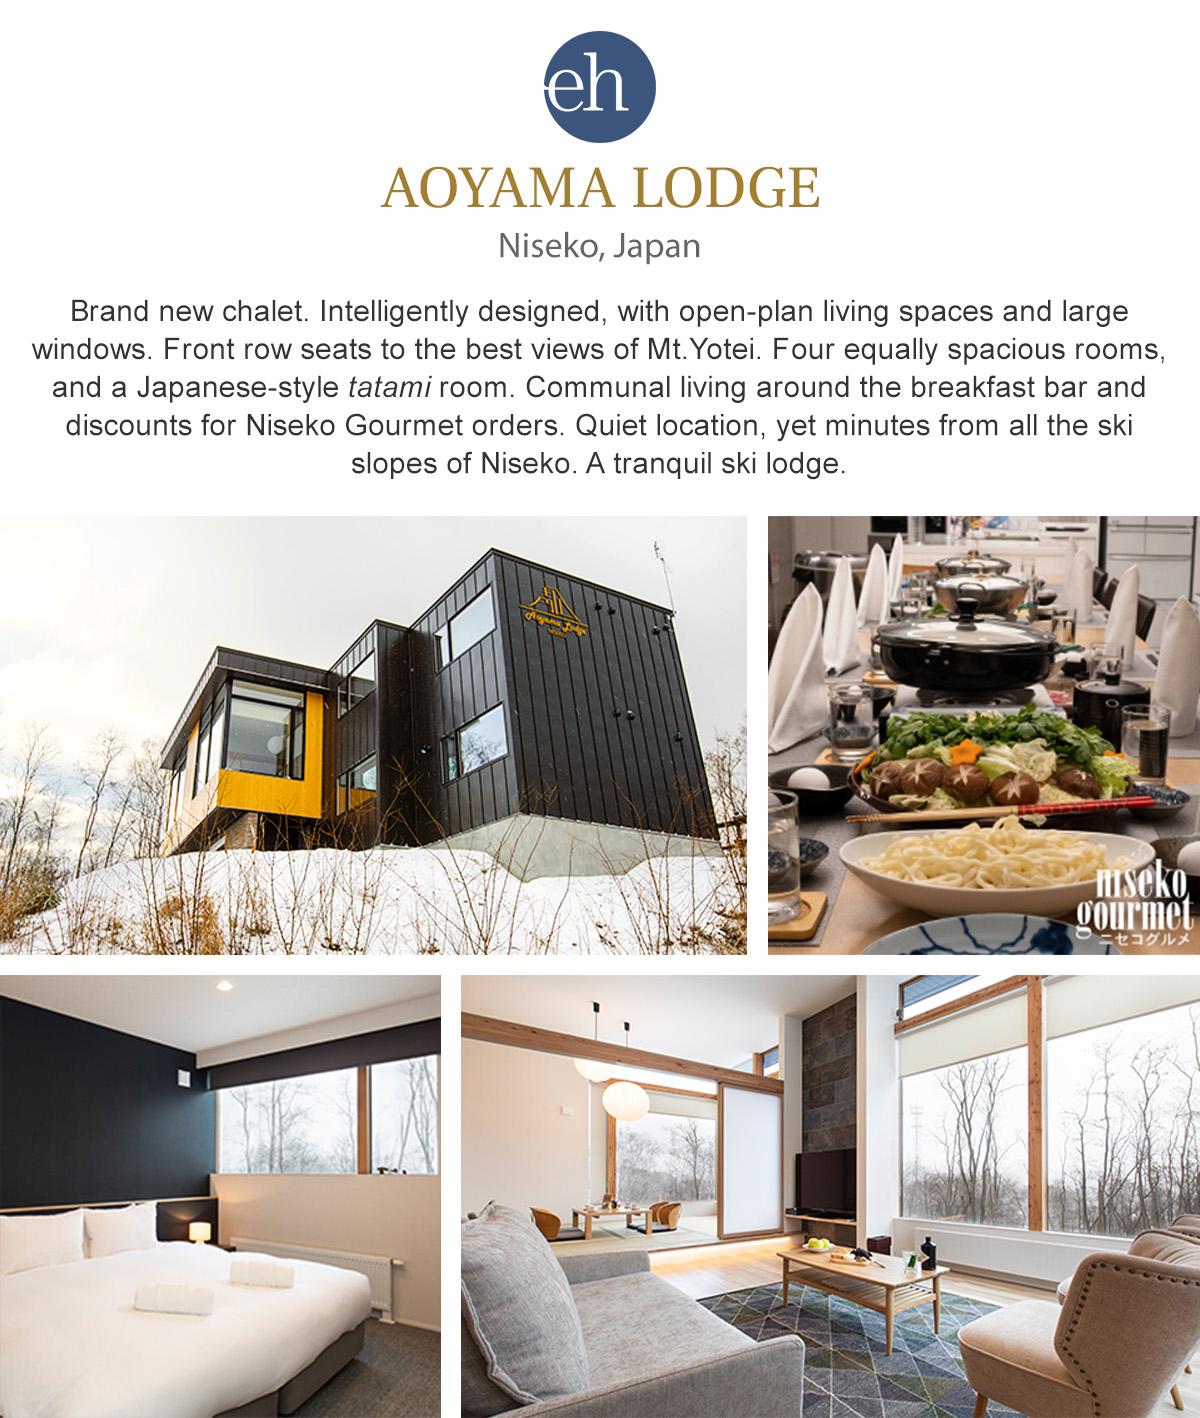 Aoyama Lodge - Niseko, Japan